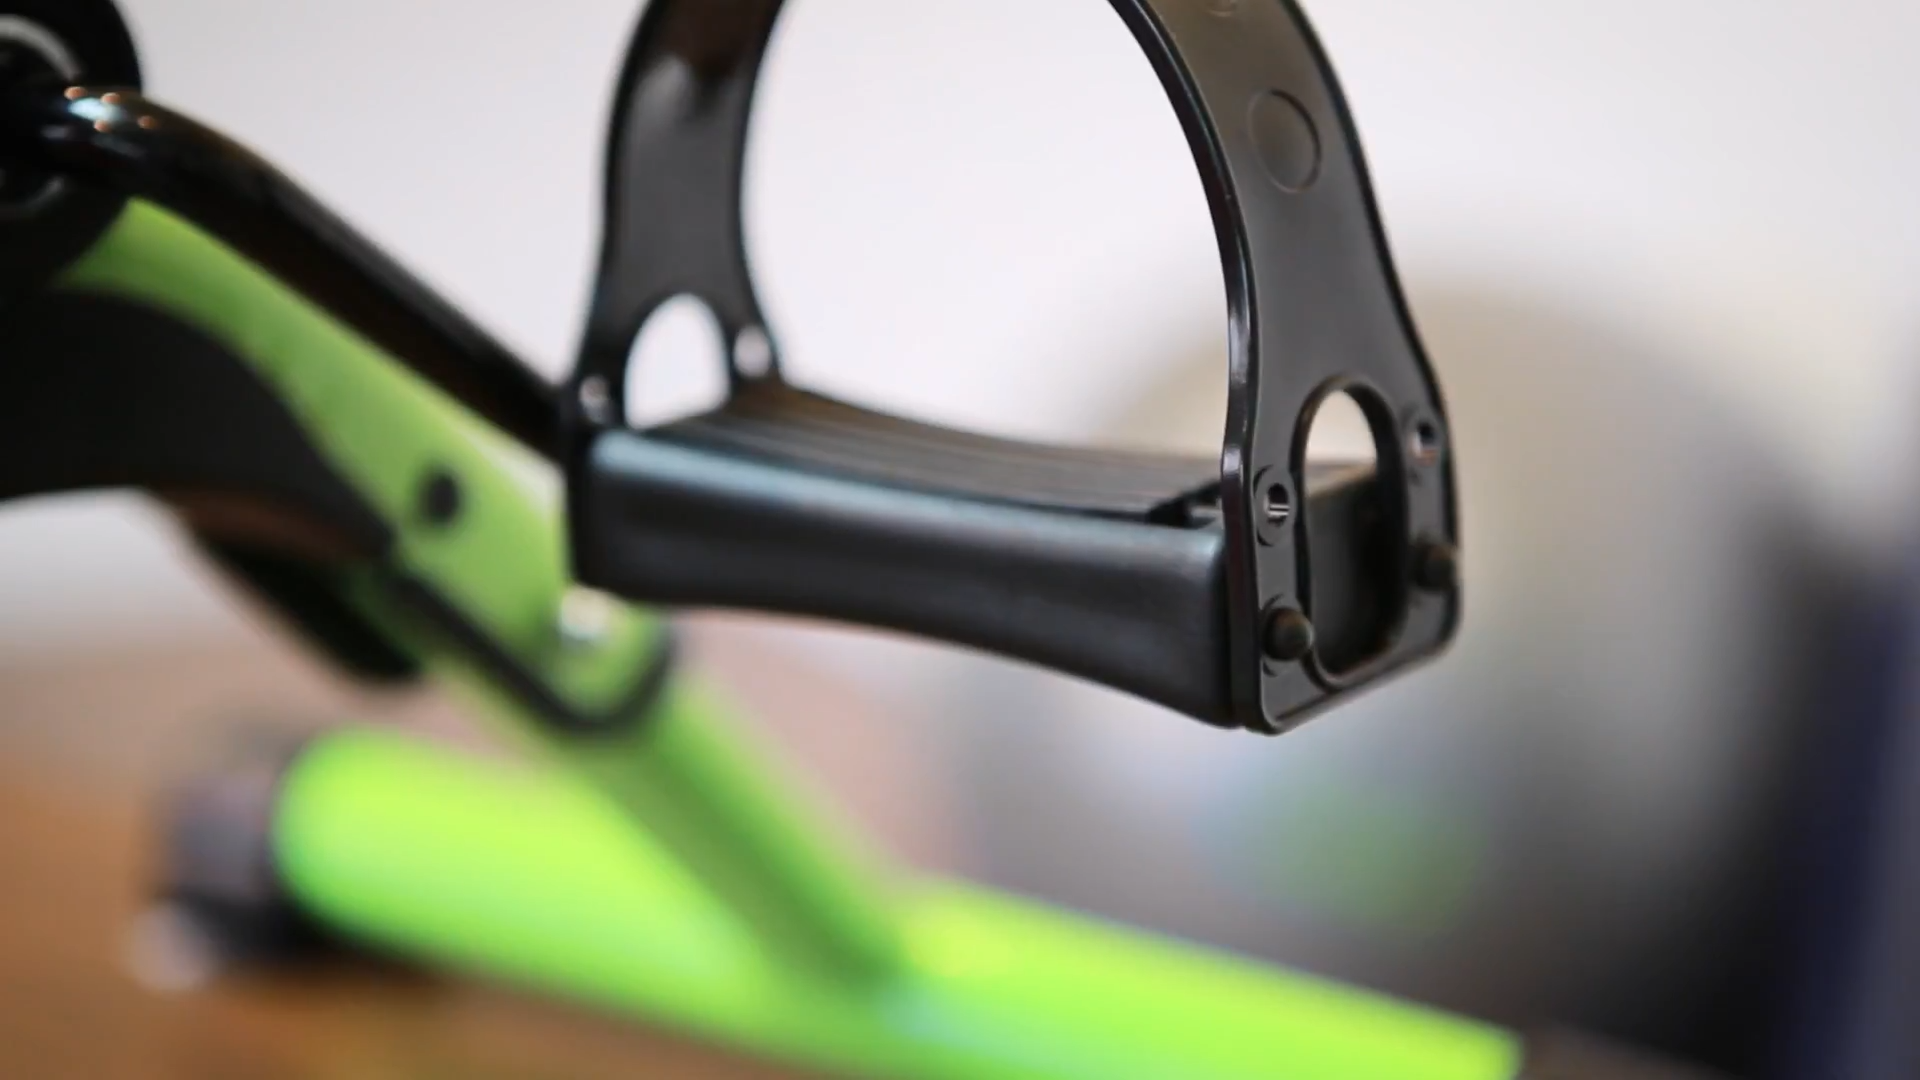 Marcy Upright Mag Bike Marcy Foldable Exercise Bike Ic4 6 Gold